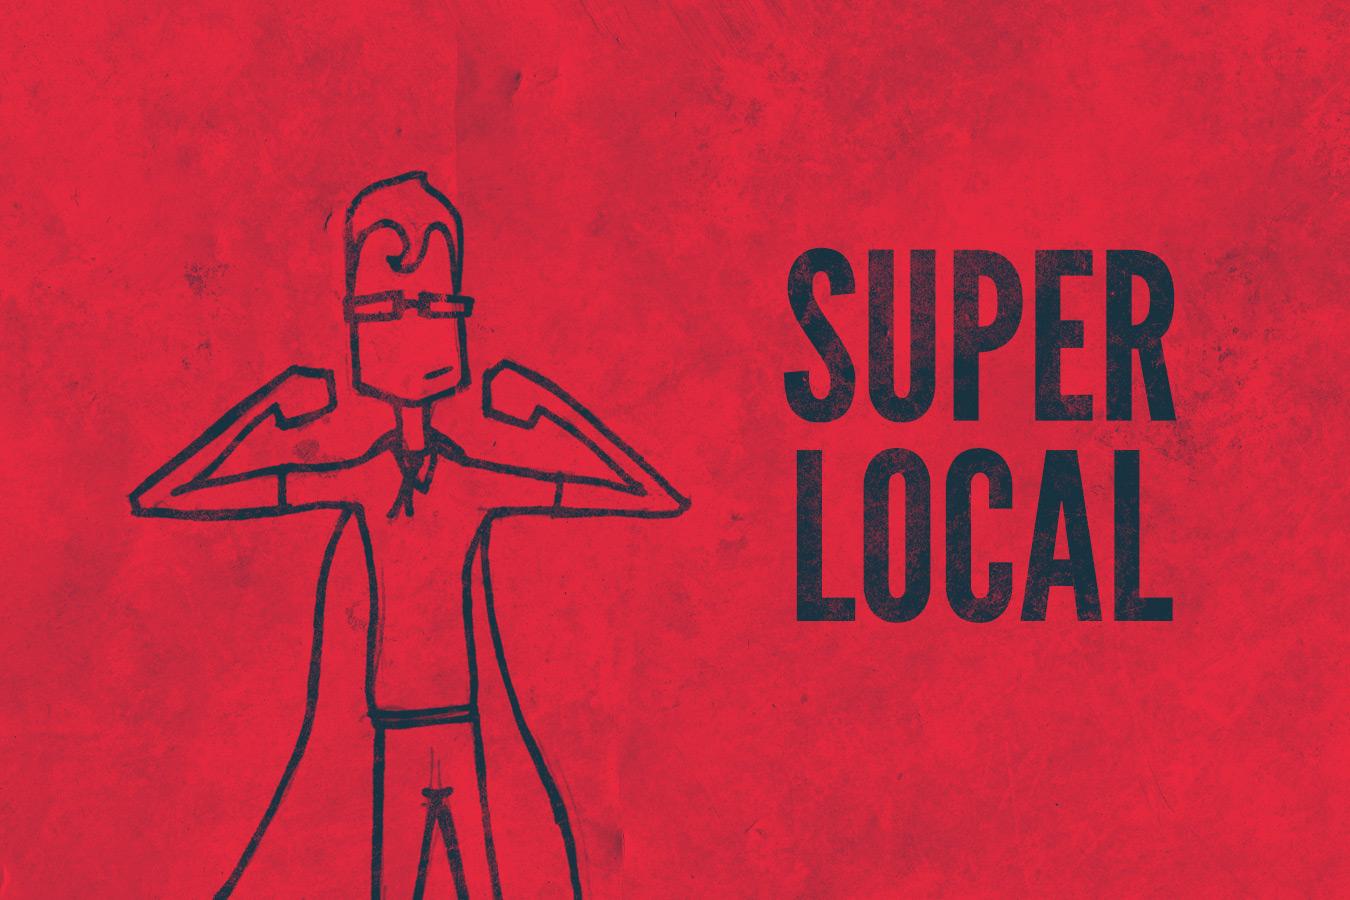 superLocal: making localStorage more useful